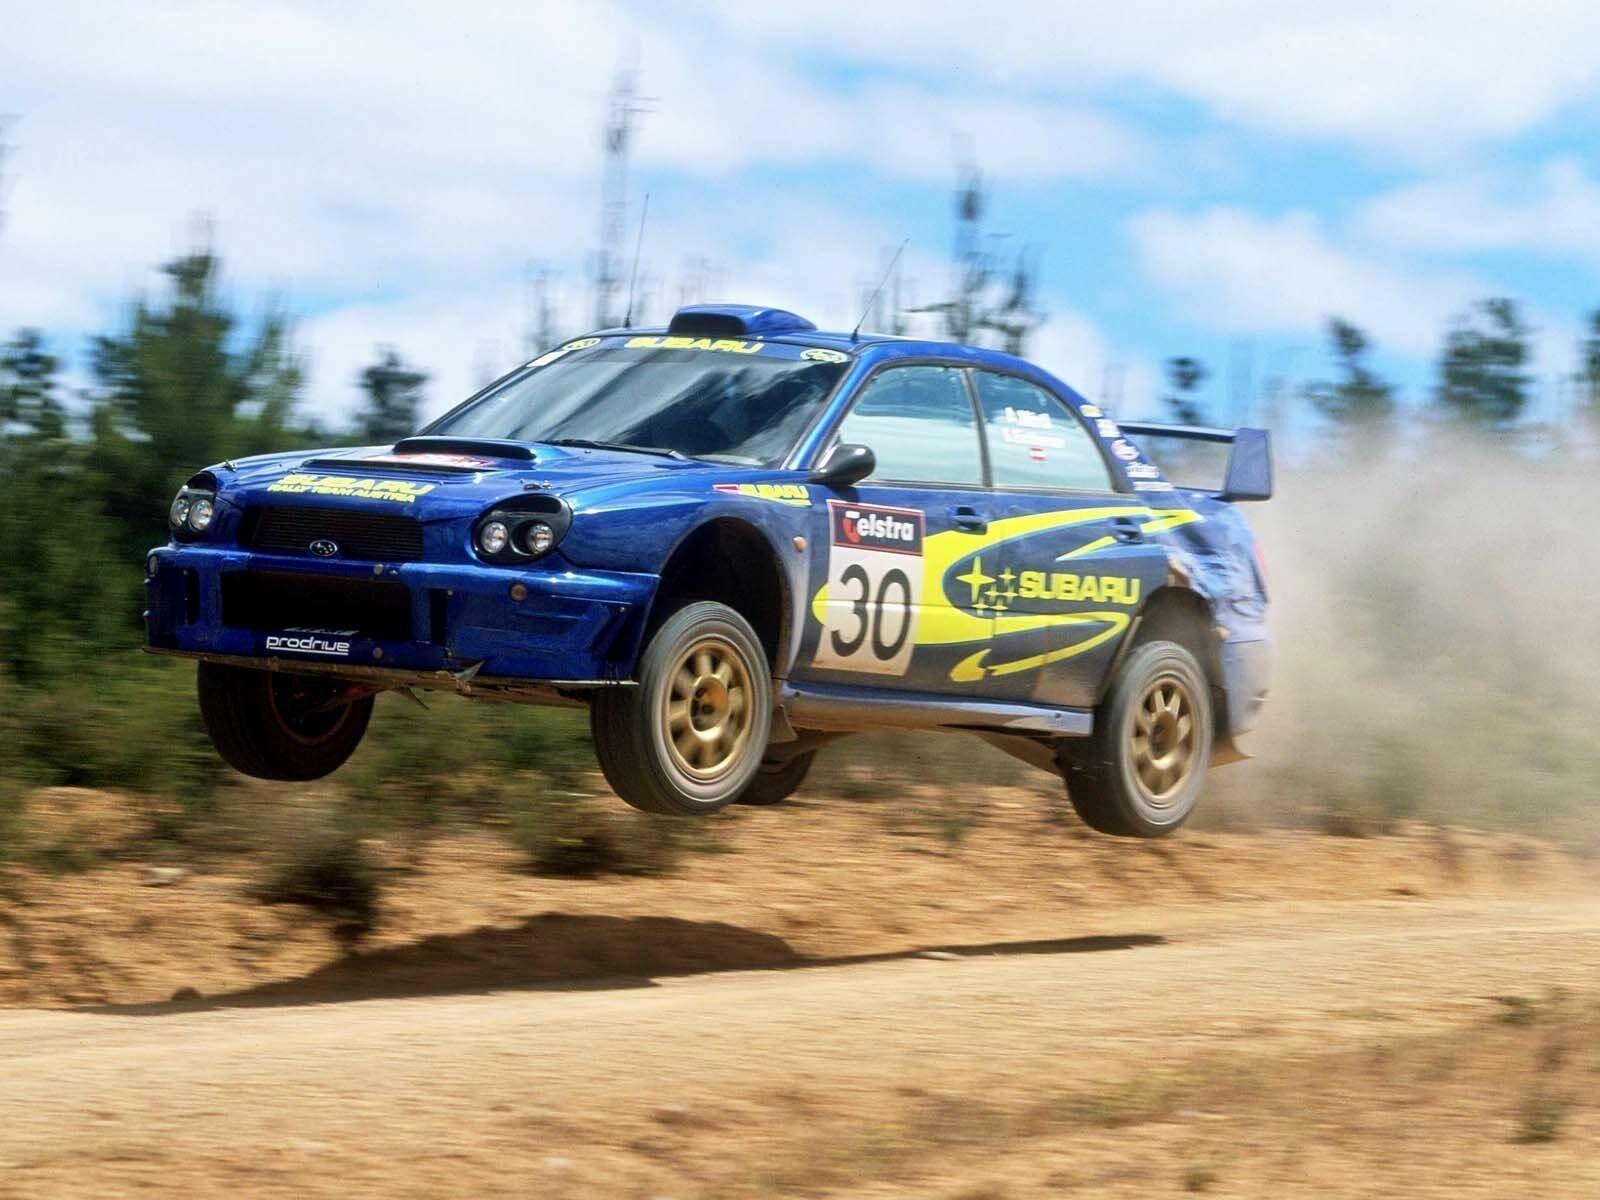 Subaru Rally Car Android Wallpapers